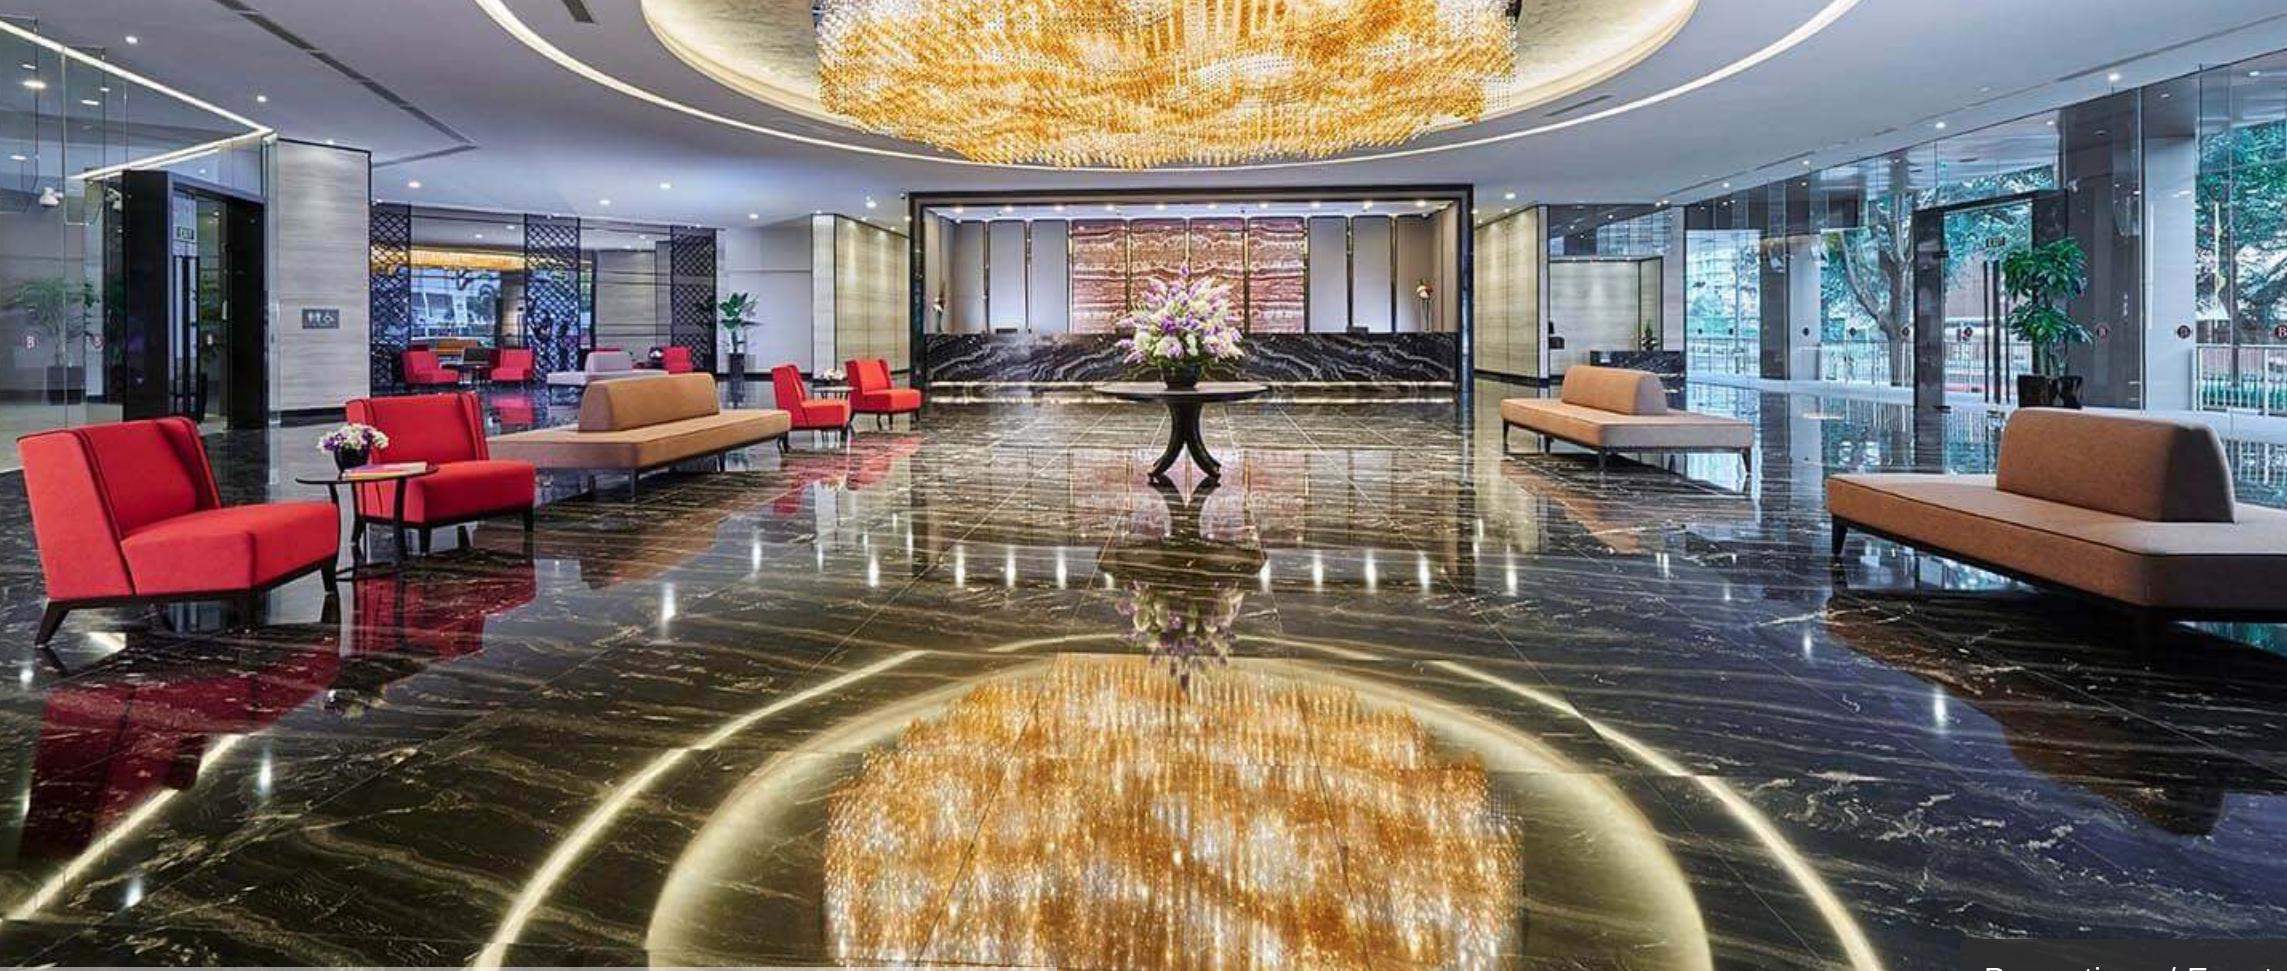 hotel boss singapore lobby